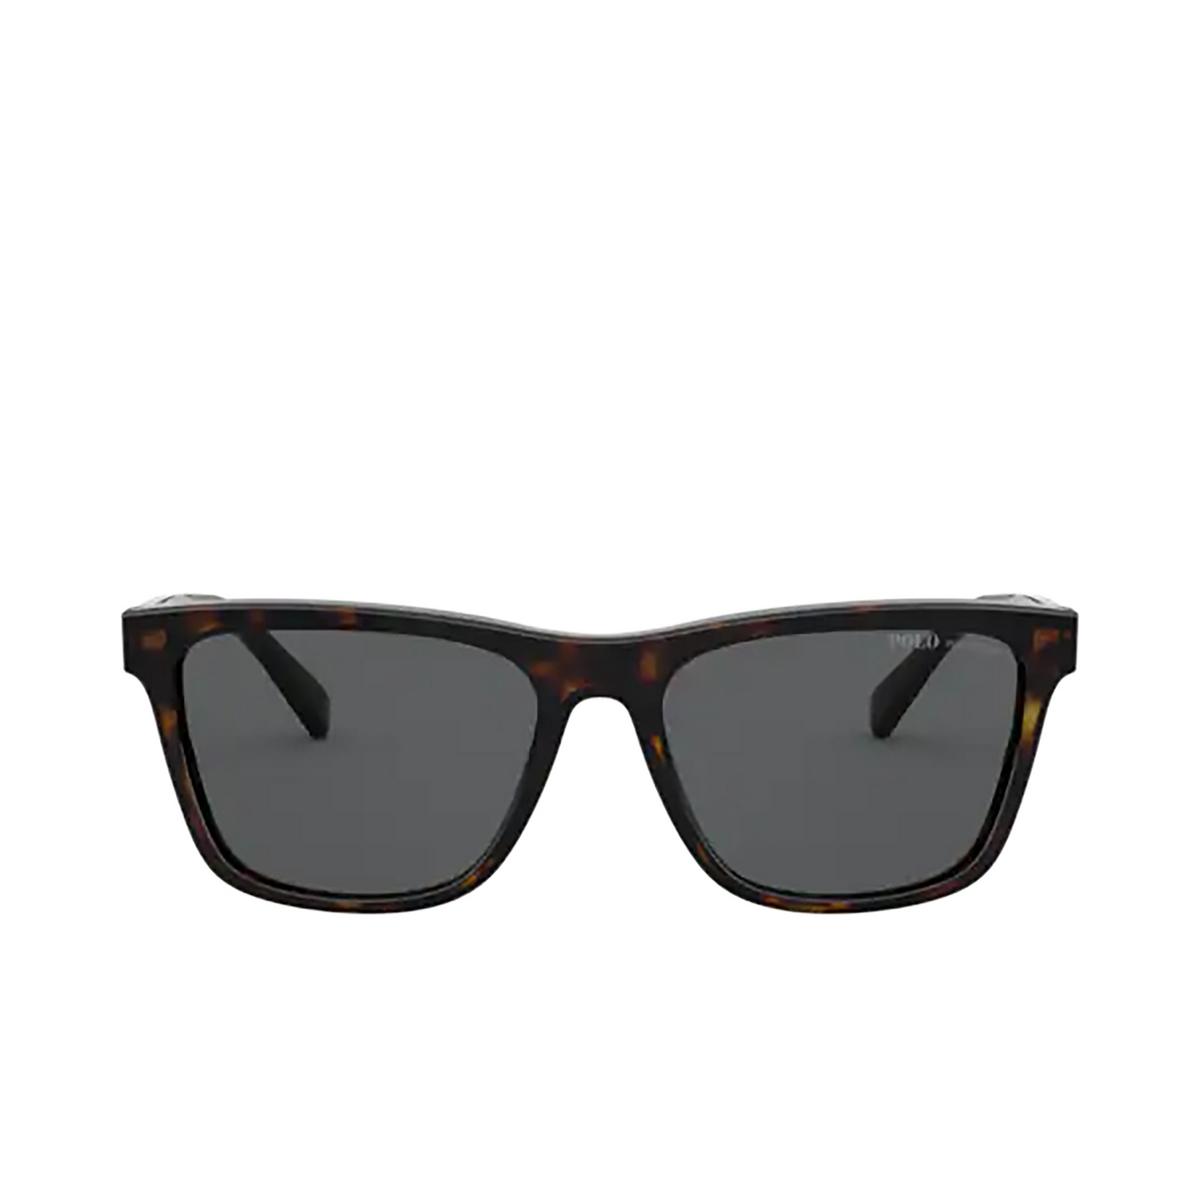 Polo Ralph Lauren® Square Sunglasses: PH4167 color Shiny Dark Havana 500387.